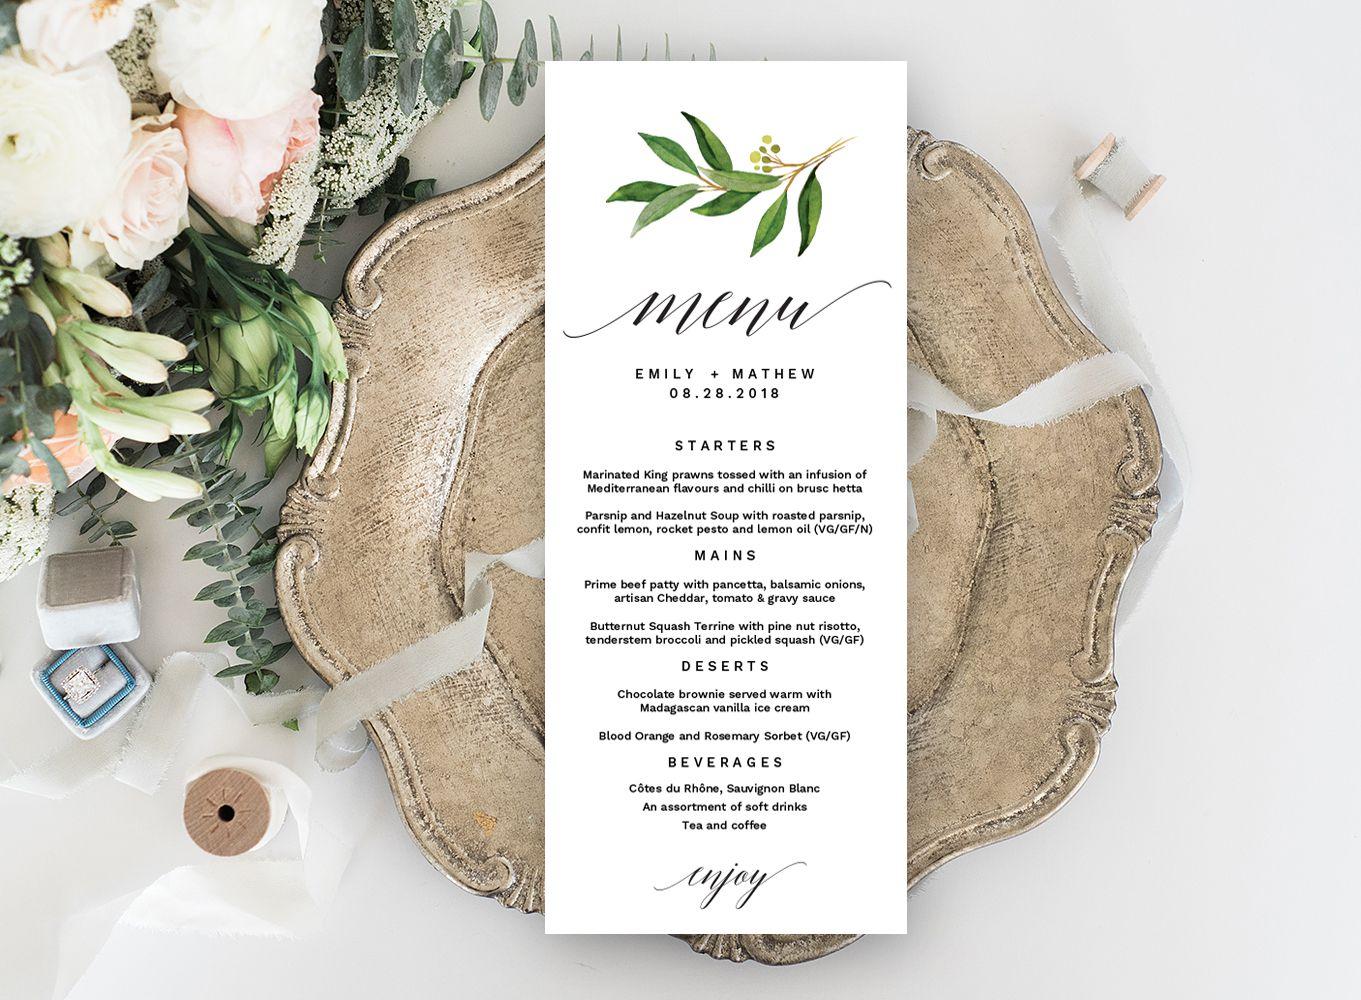 004 Astounding Free Printable Wedding Menu Card Template Picture  TemplatesFull